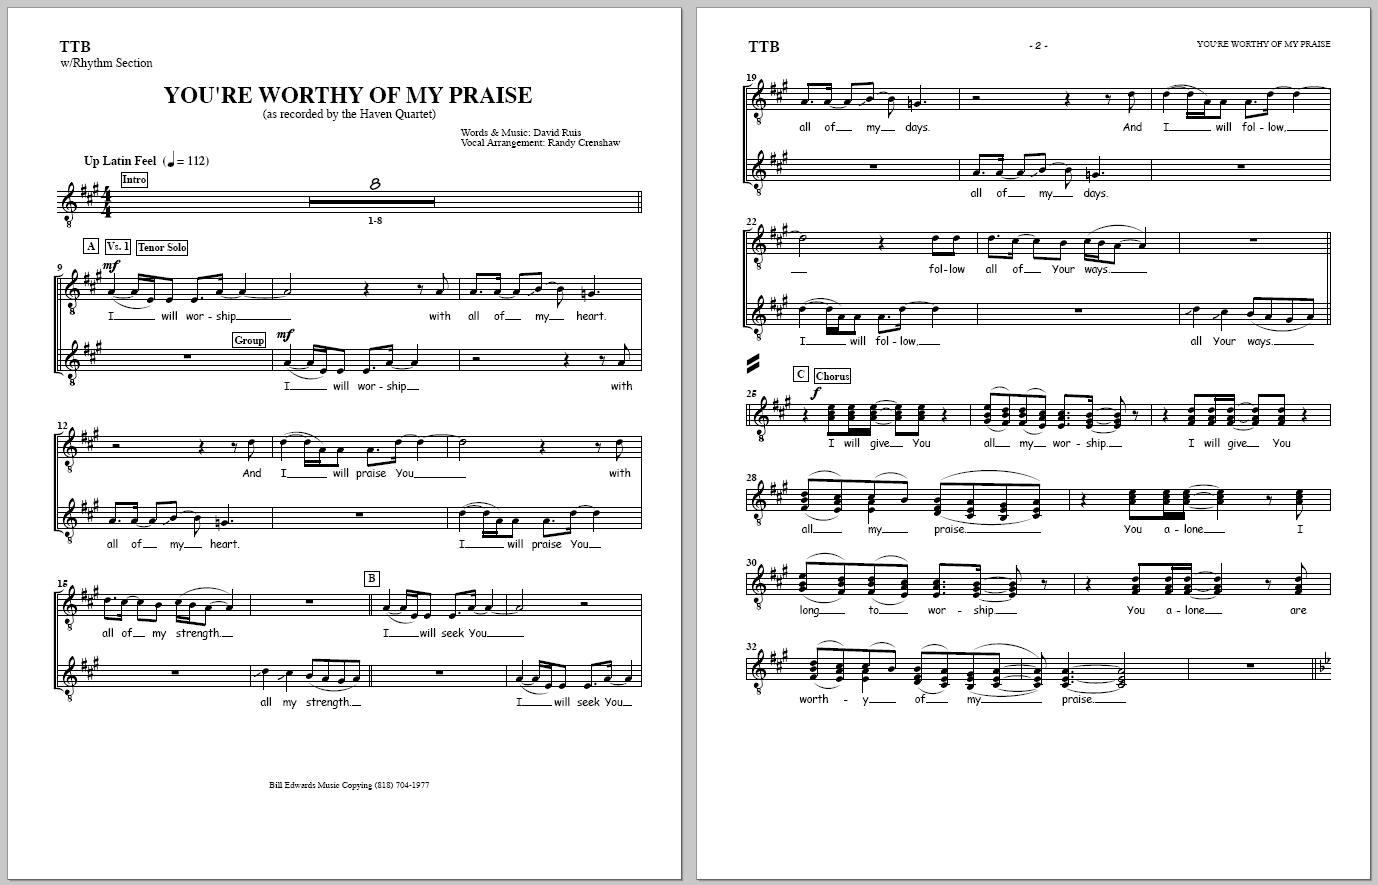 Ly lyrics to something about my praise - Preview Master Rhythm